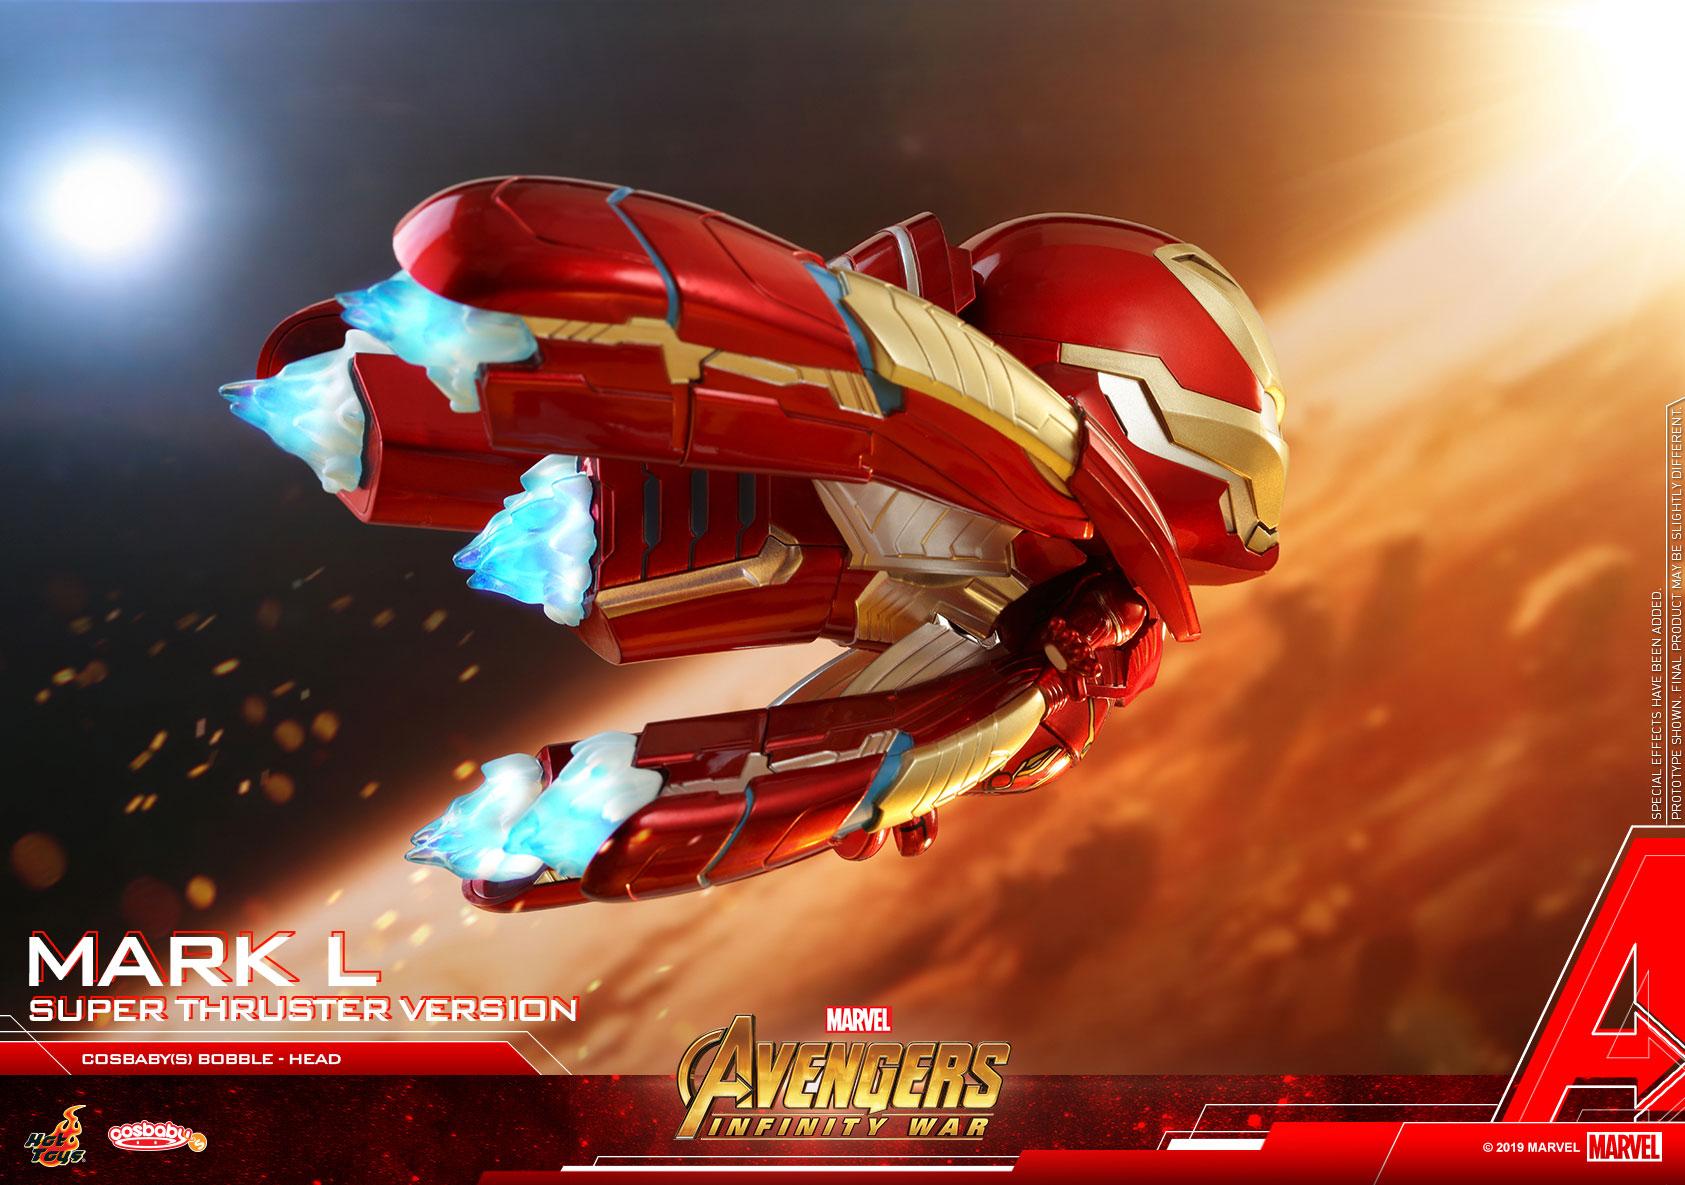 Hot-Toys---Avengers3---Mark-L-(Super-Thruster-Version)-Cosbaby-(S)_PR2